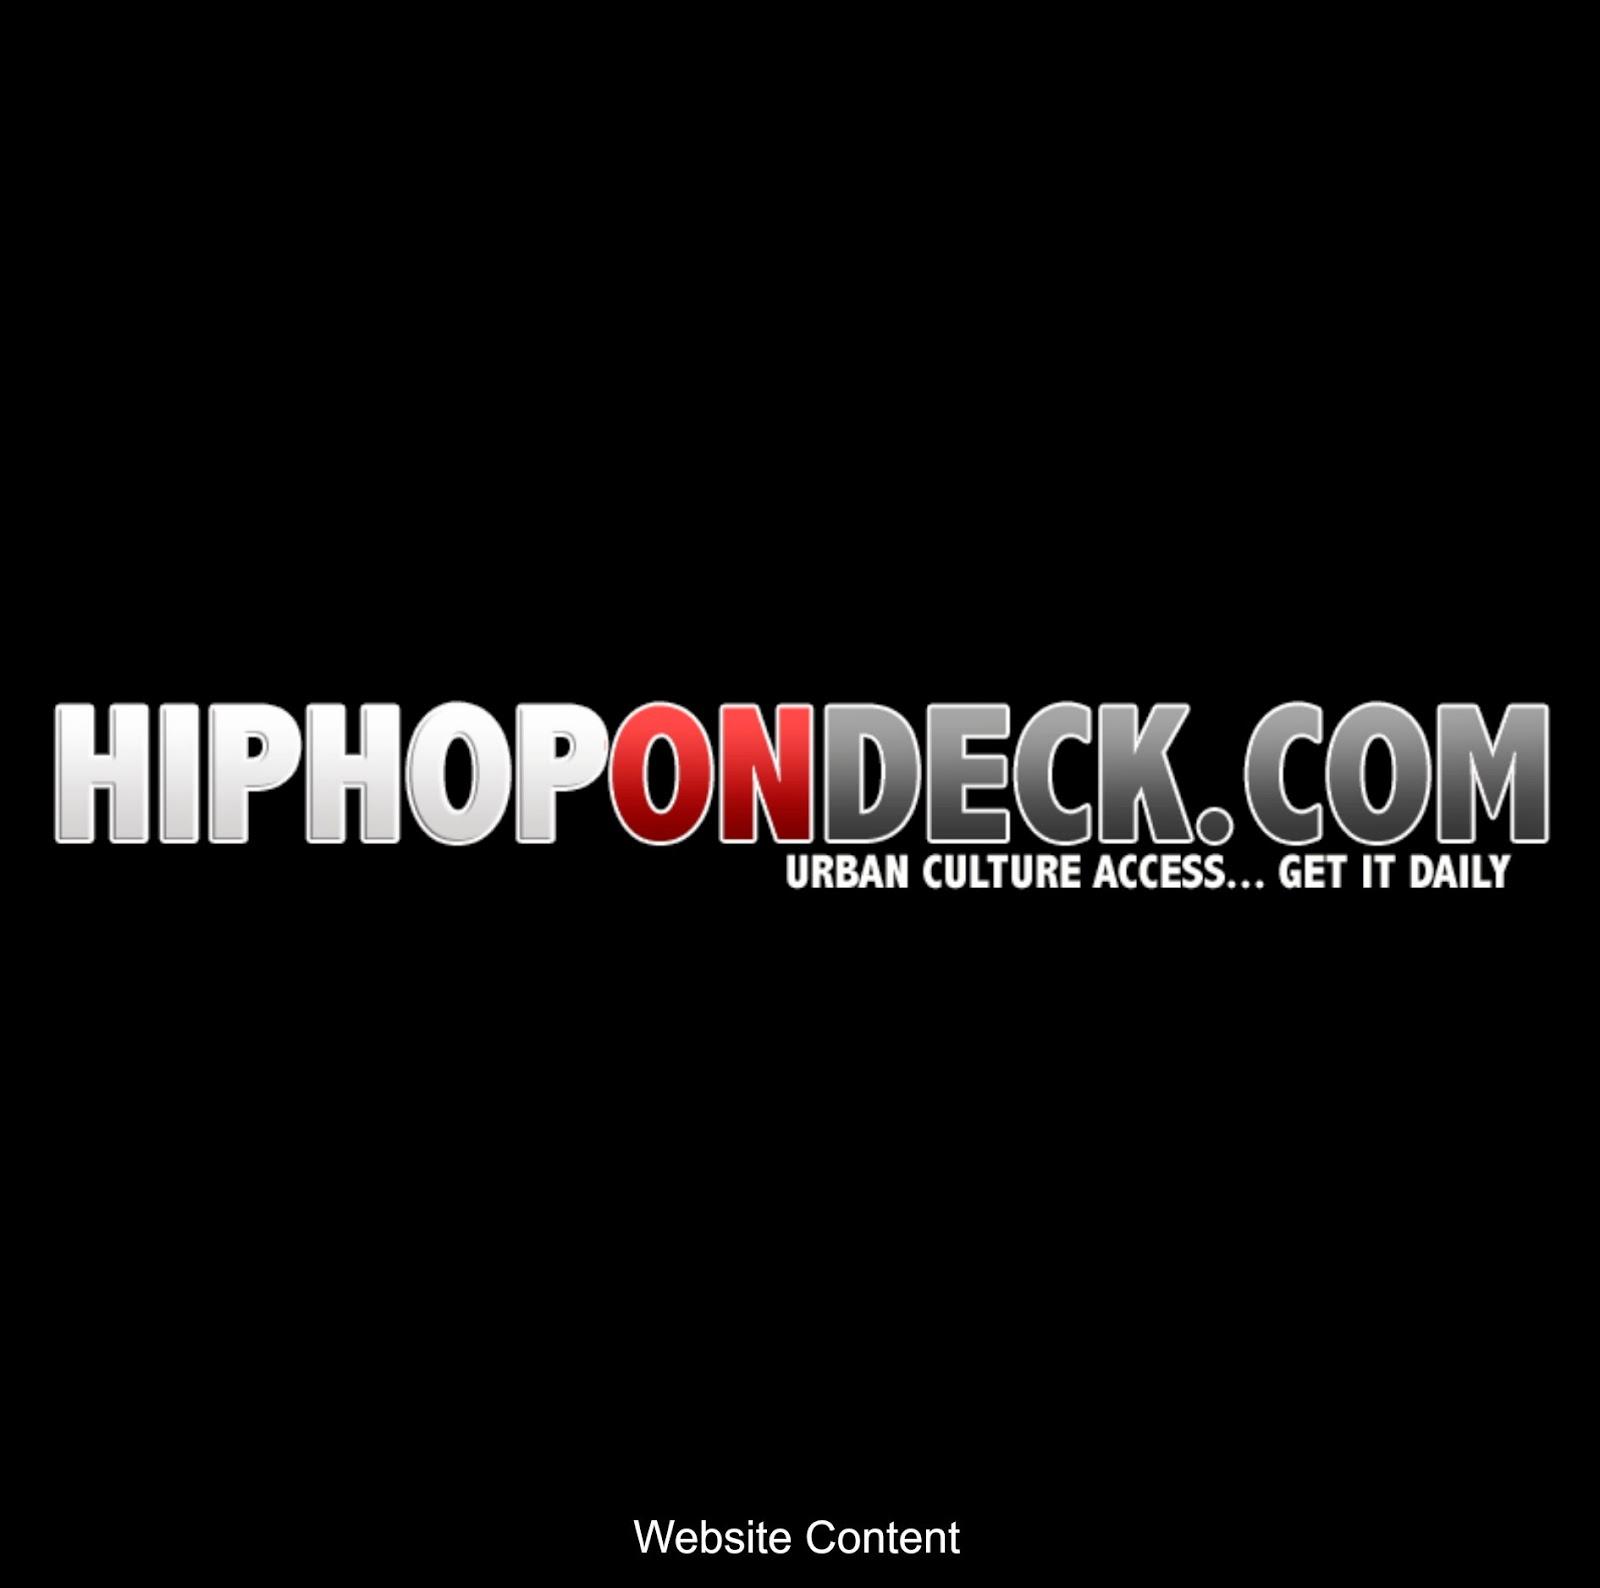 www.hiphopondeck.com